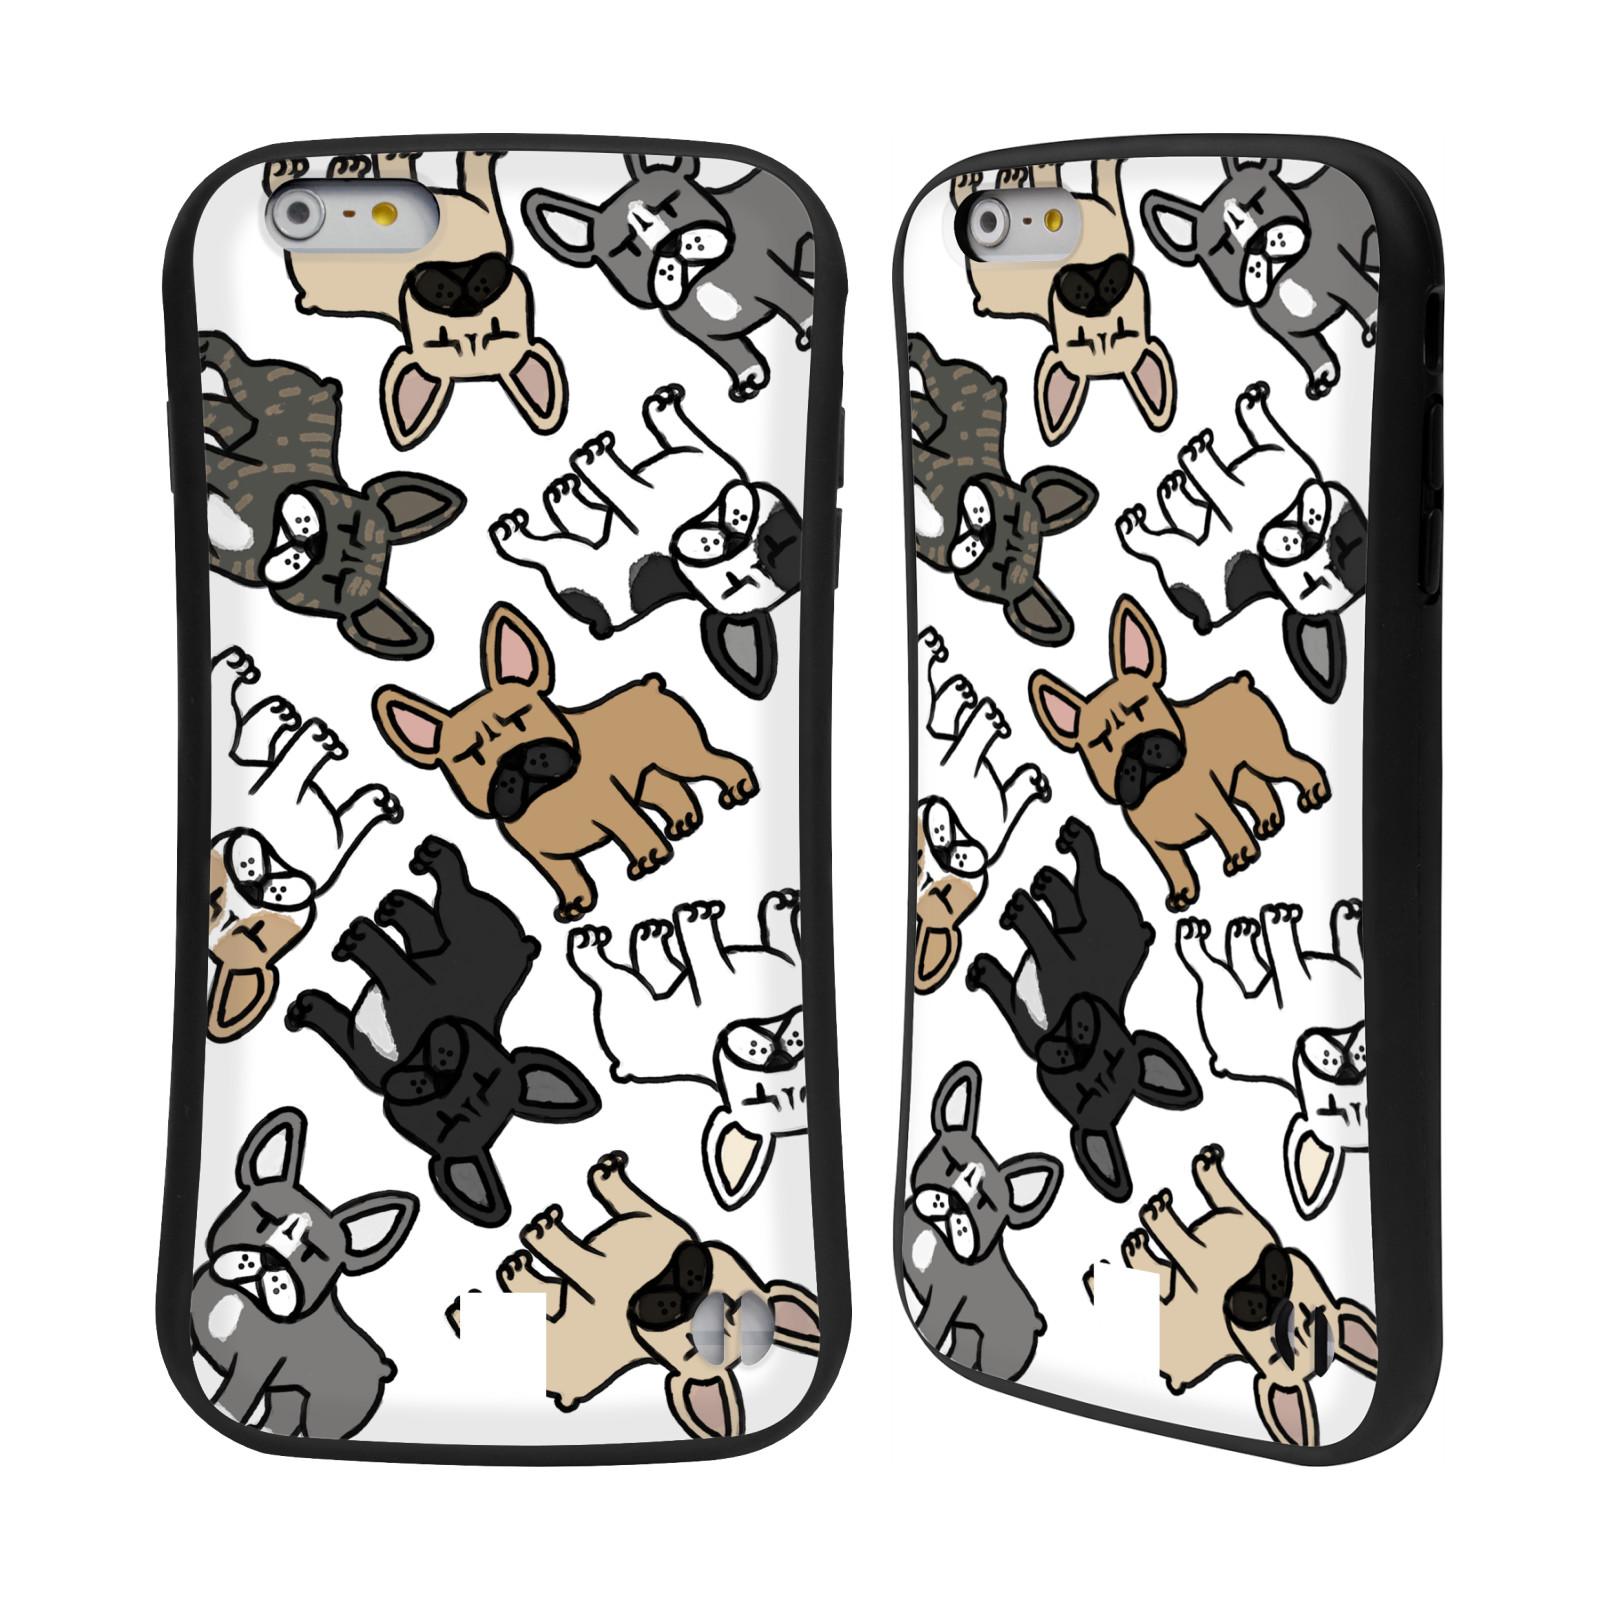 HEAD CASE odolný obal na mobil Apple Iphone 6 6S PLUS pejsek francouzský  buldog empty 0e140b6ada7